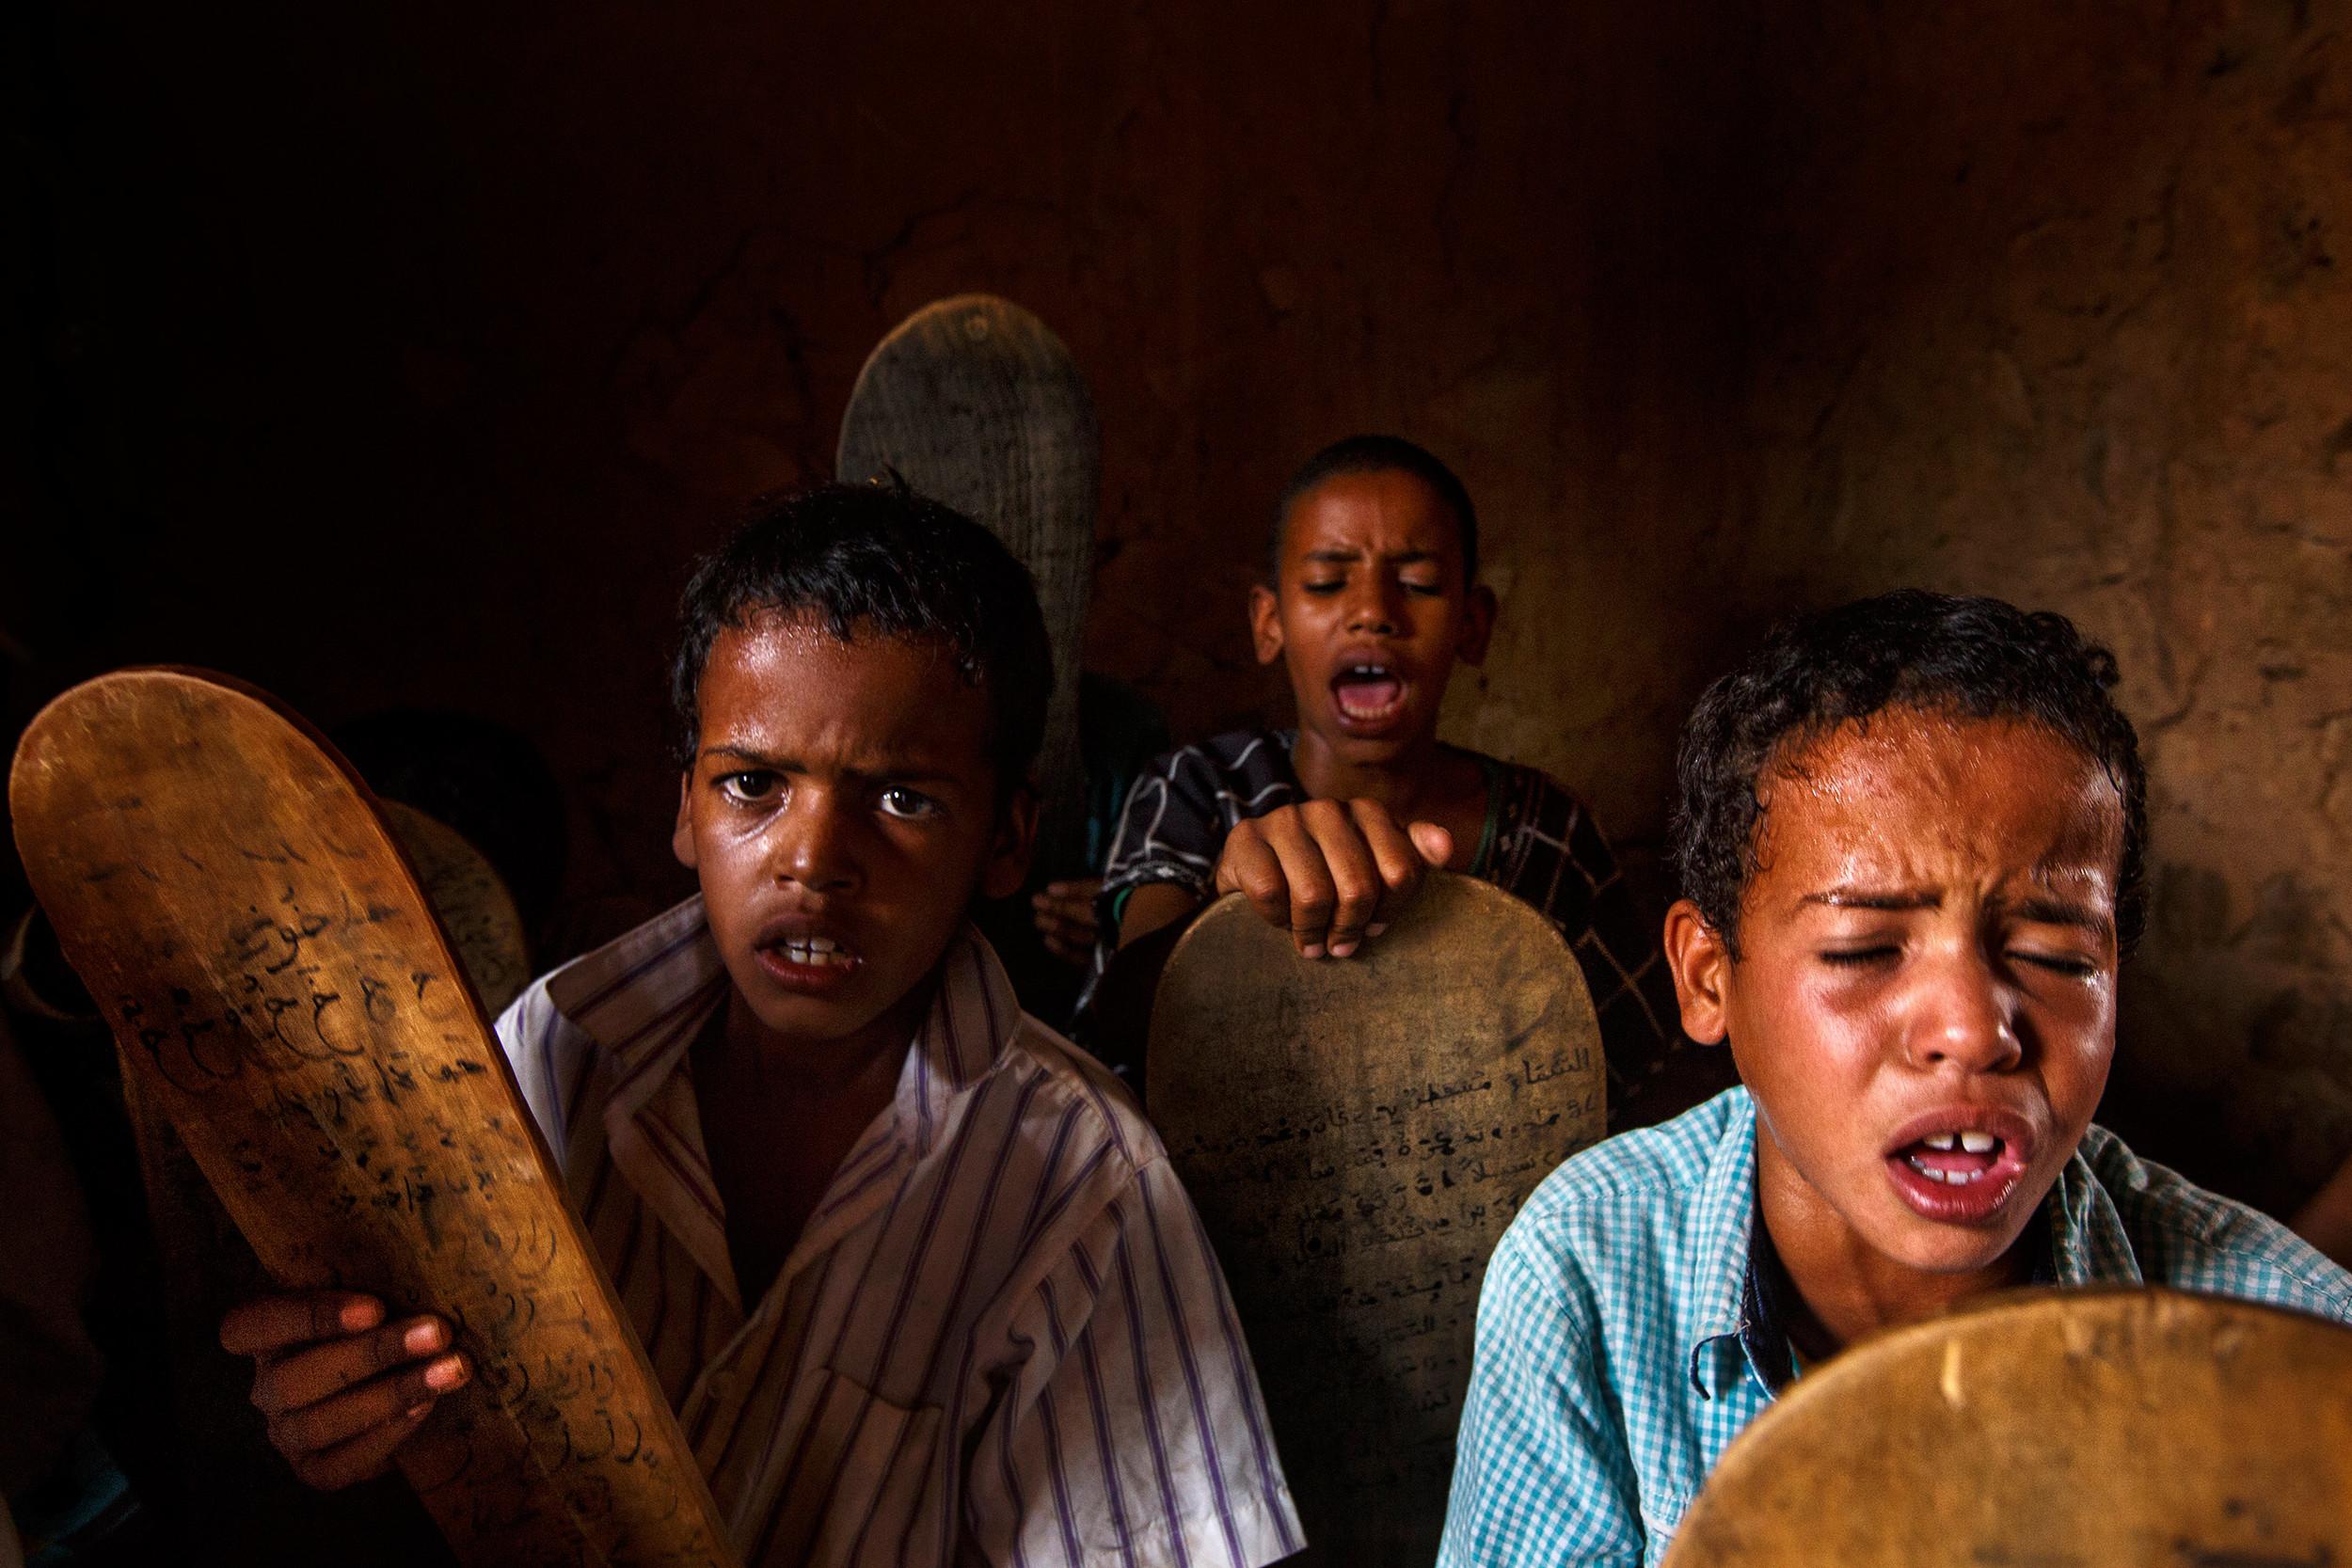 Children reciting the Q'ran in a Mahadara in Mauritania